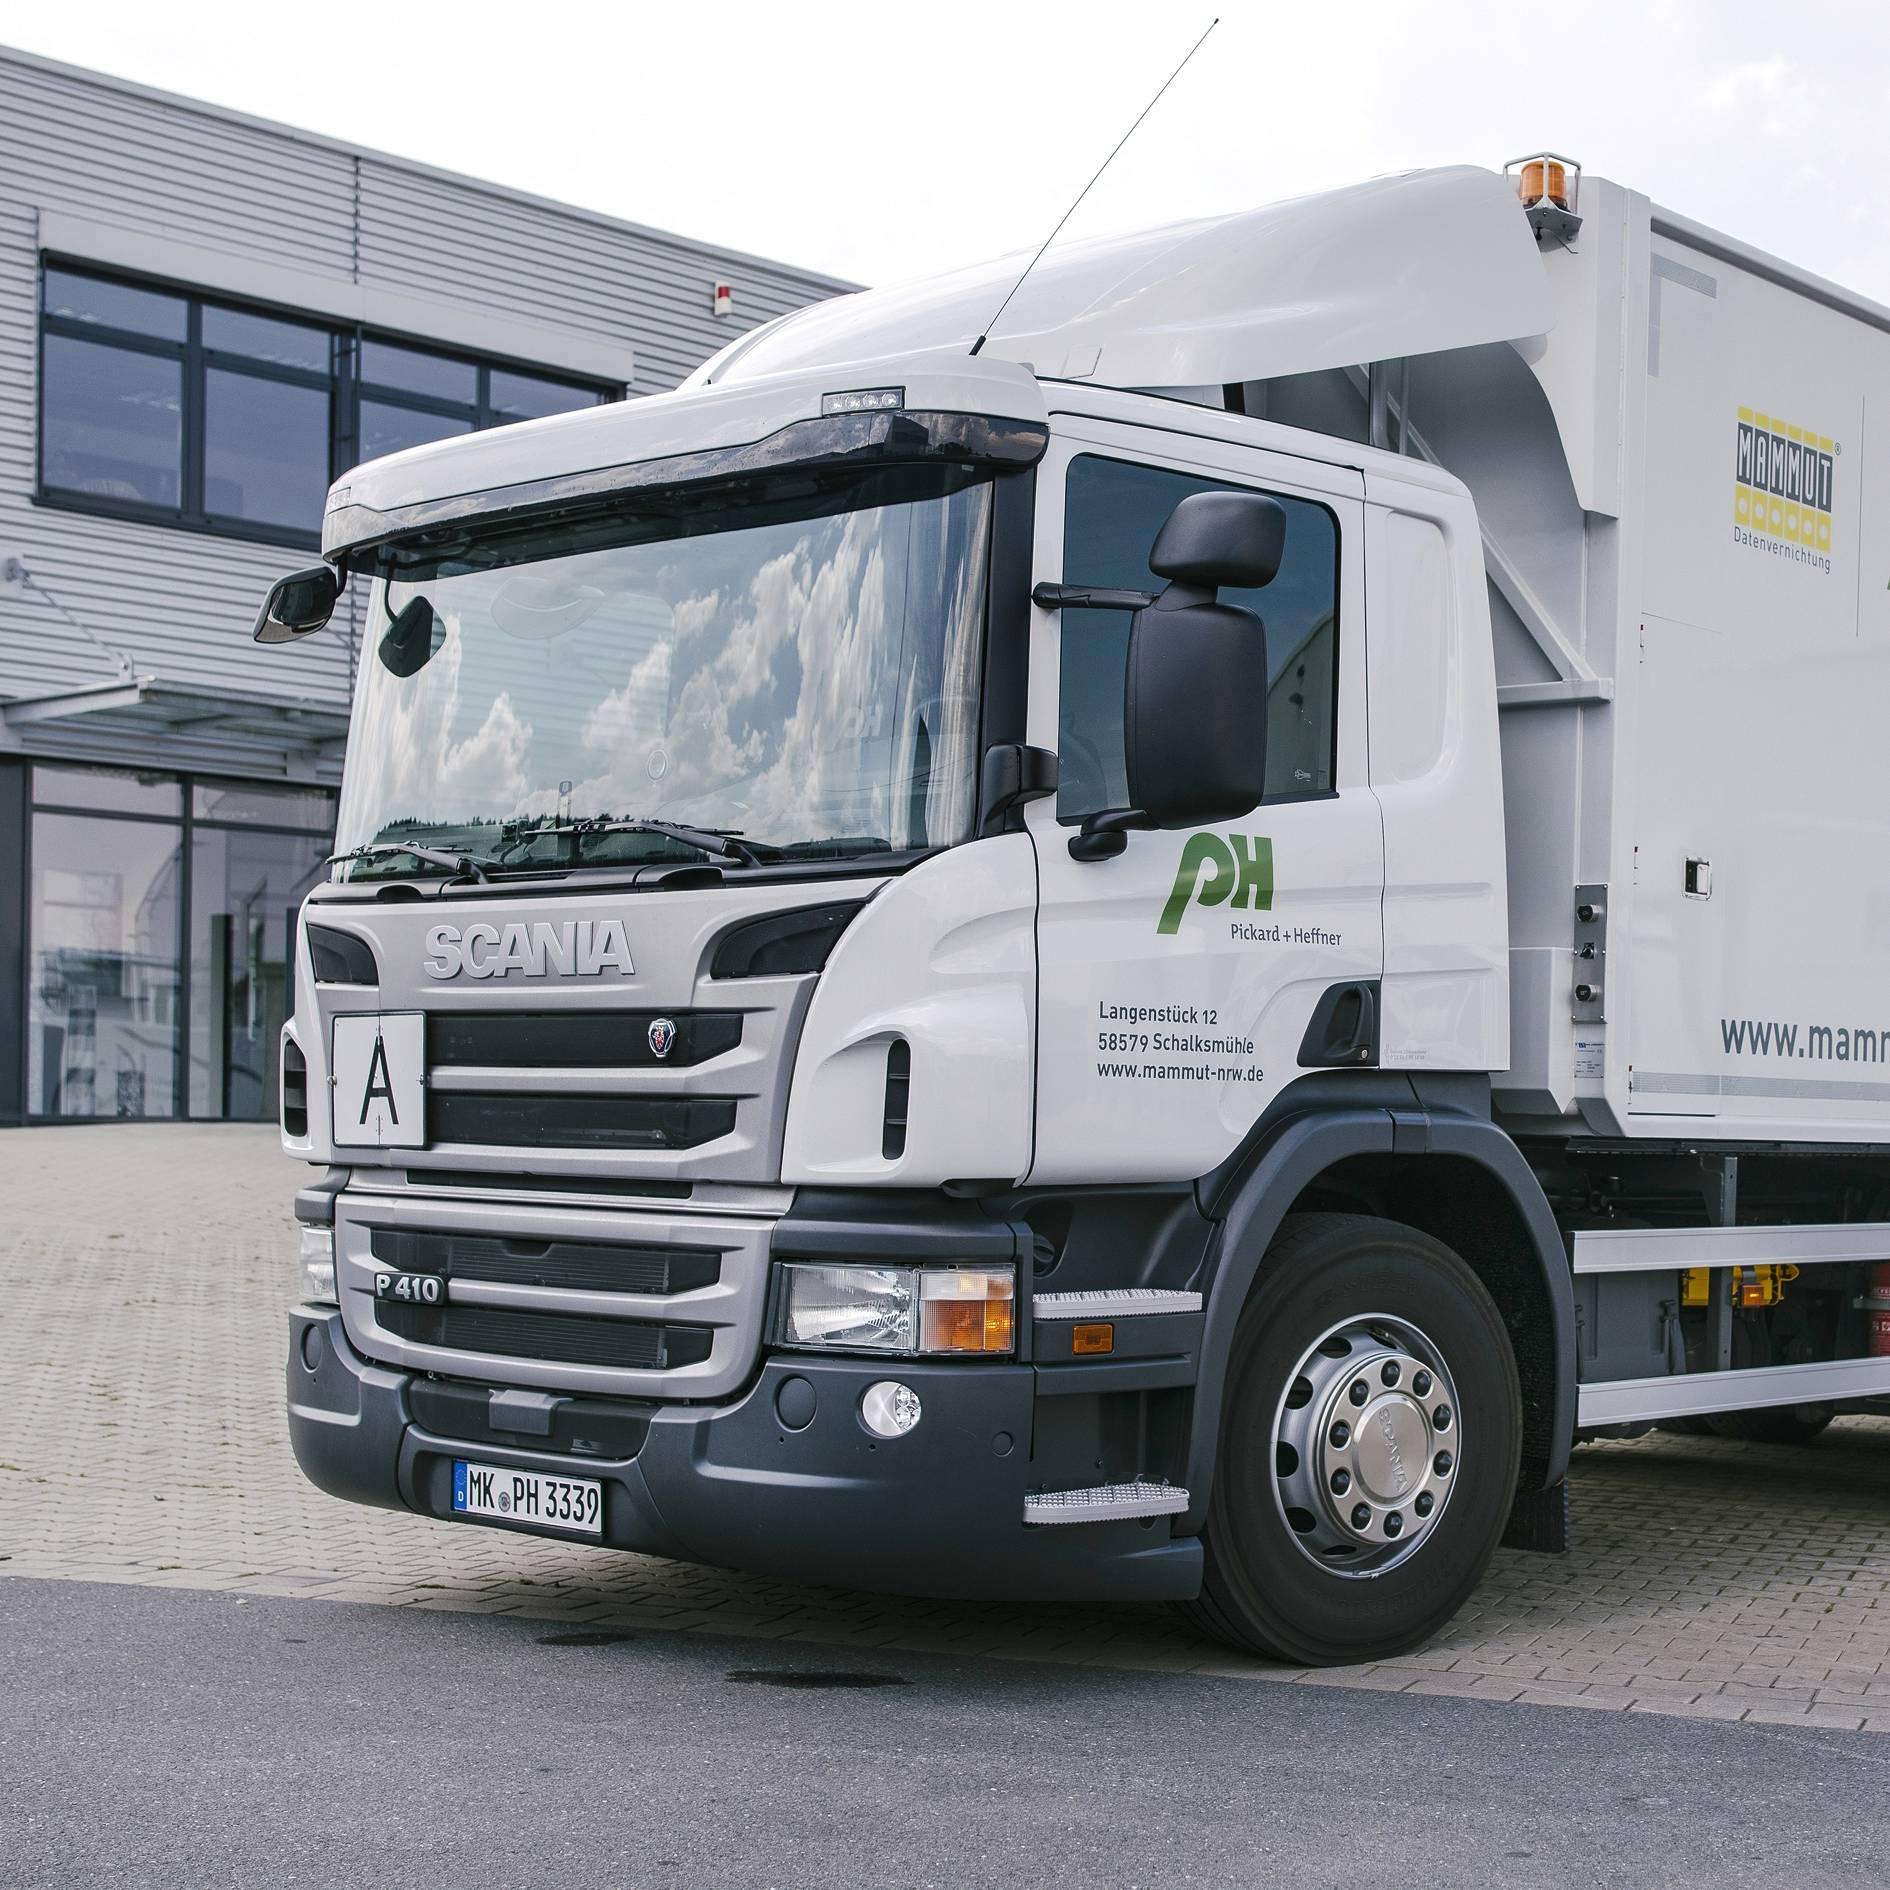 5 bis 100 kg – mobile Datenträgervernichtung in Leipzig